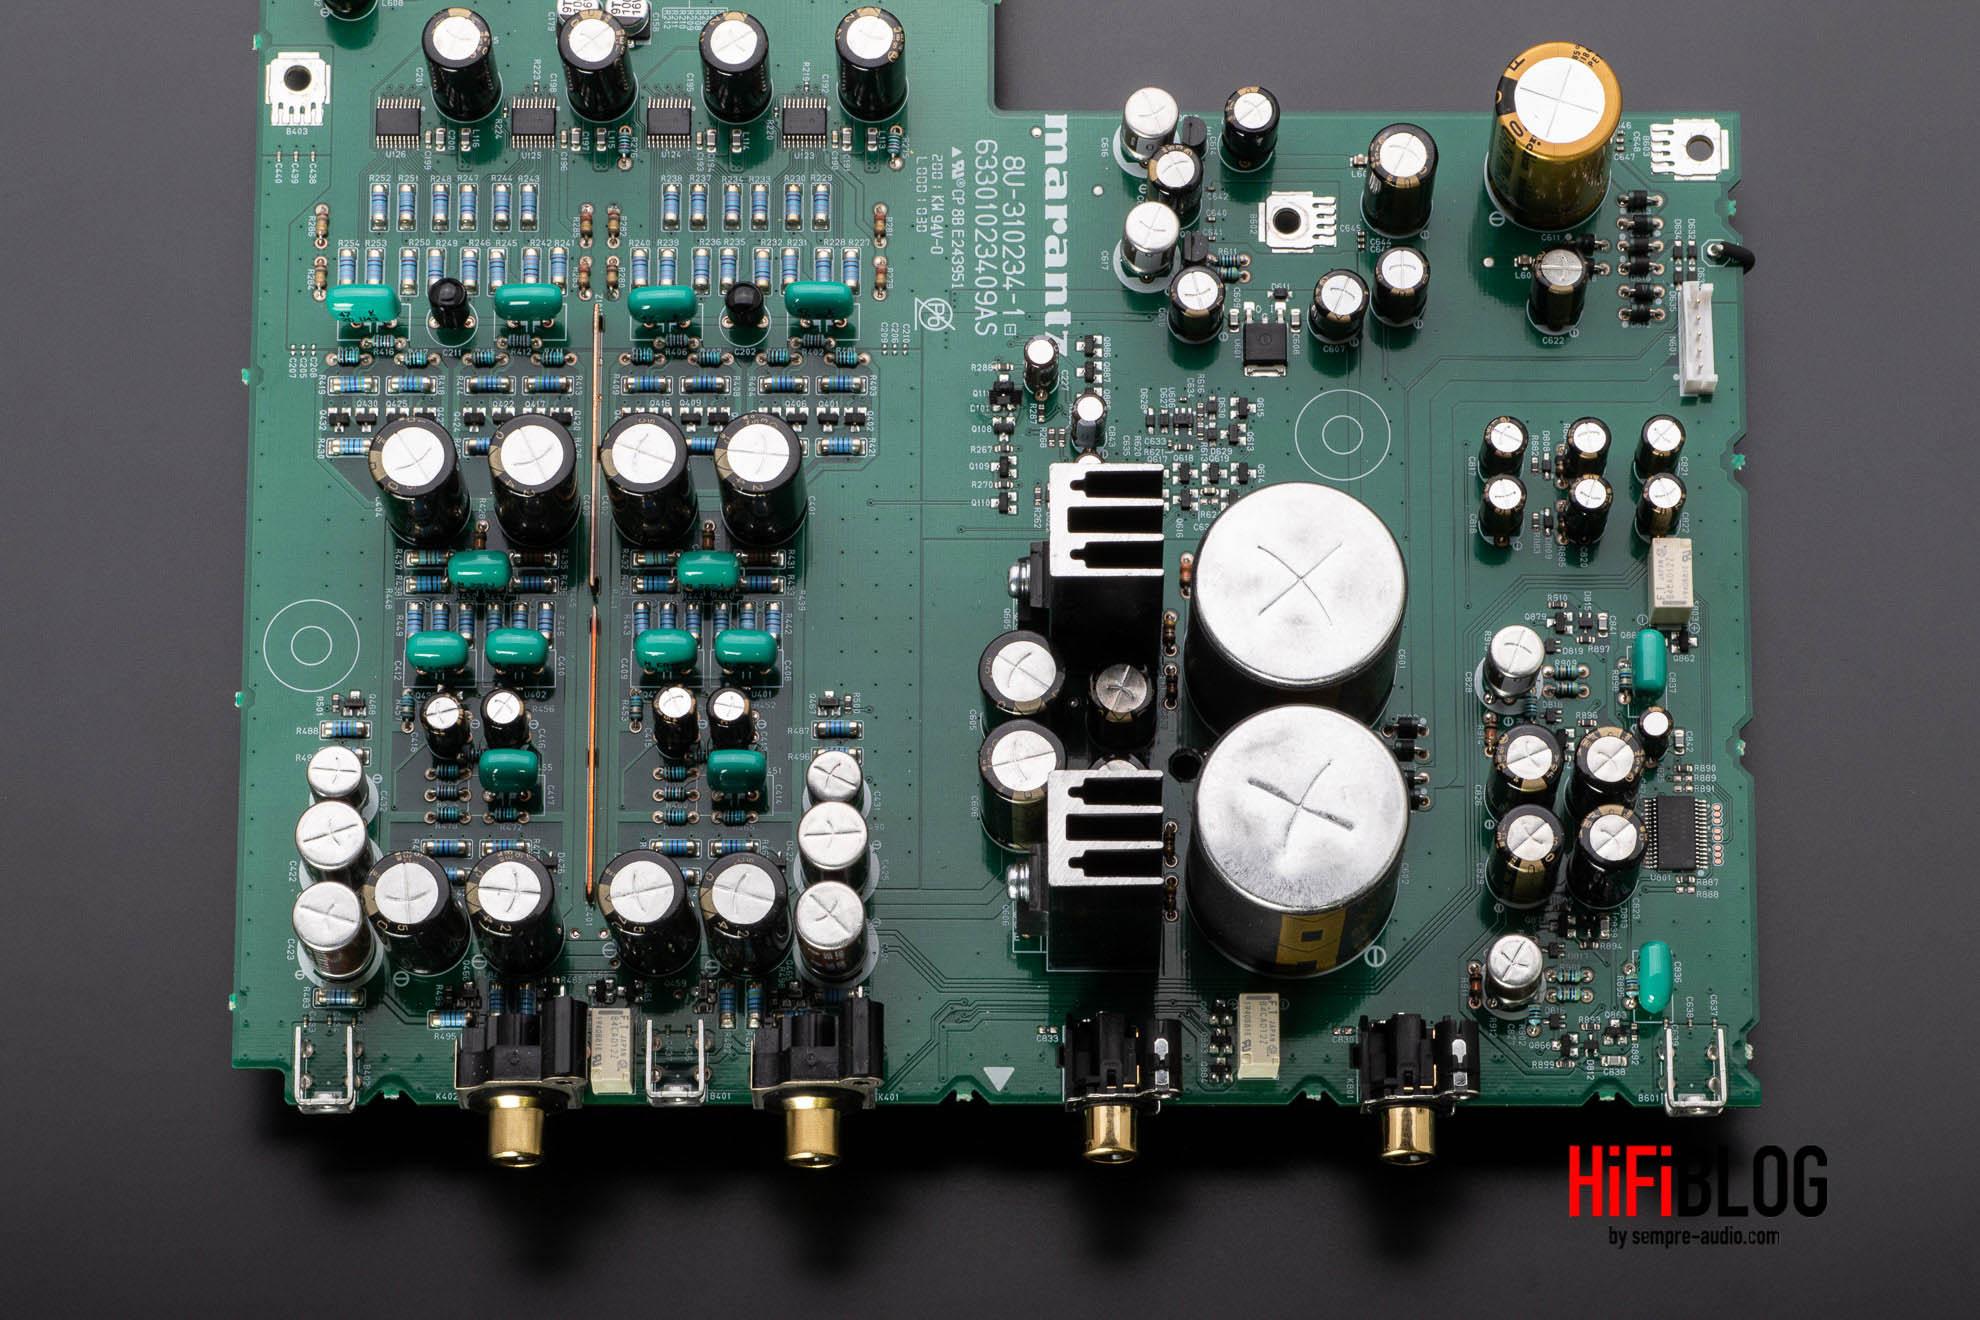 Marantz Model 30 Integrated Amplifier and SACD 30n Network SACD Player 51